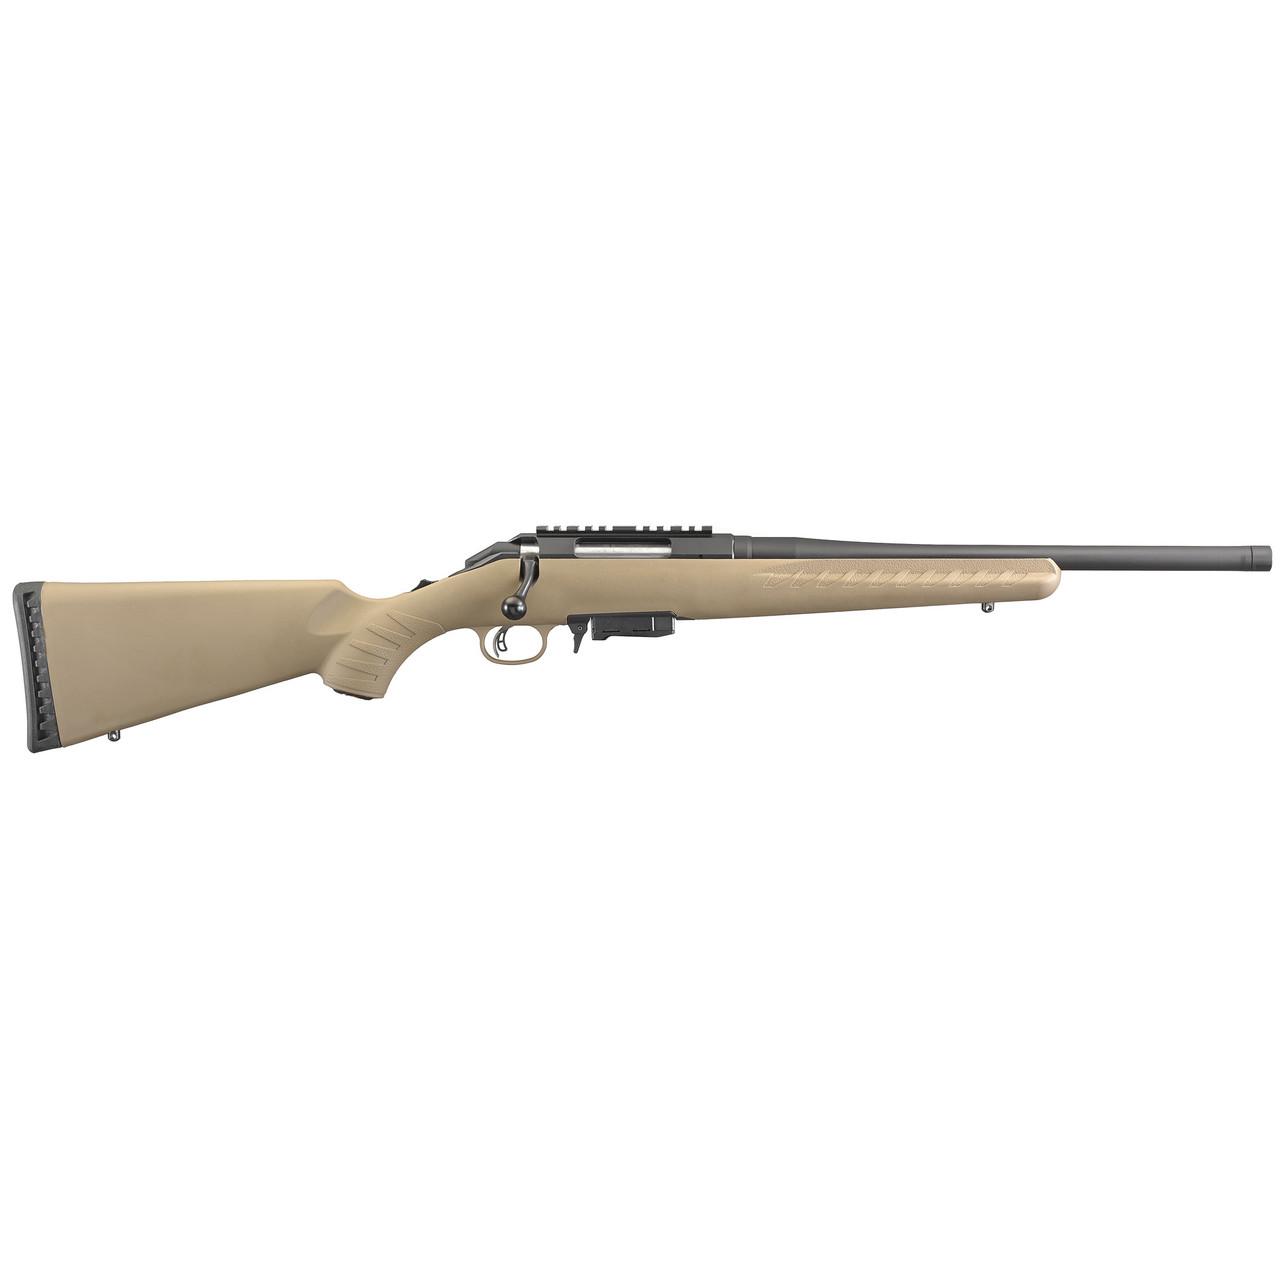 Ruger American Ranch Rifle CALIFORNIA LEGAL - 7.62x39 - FDE